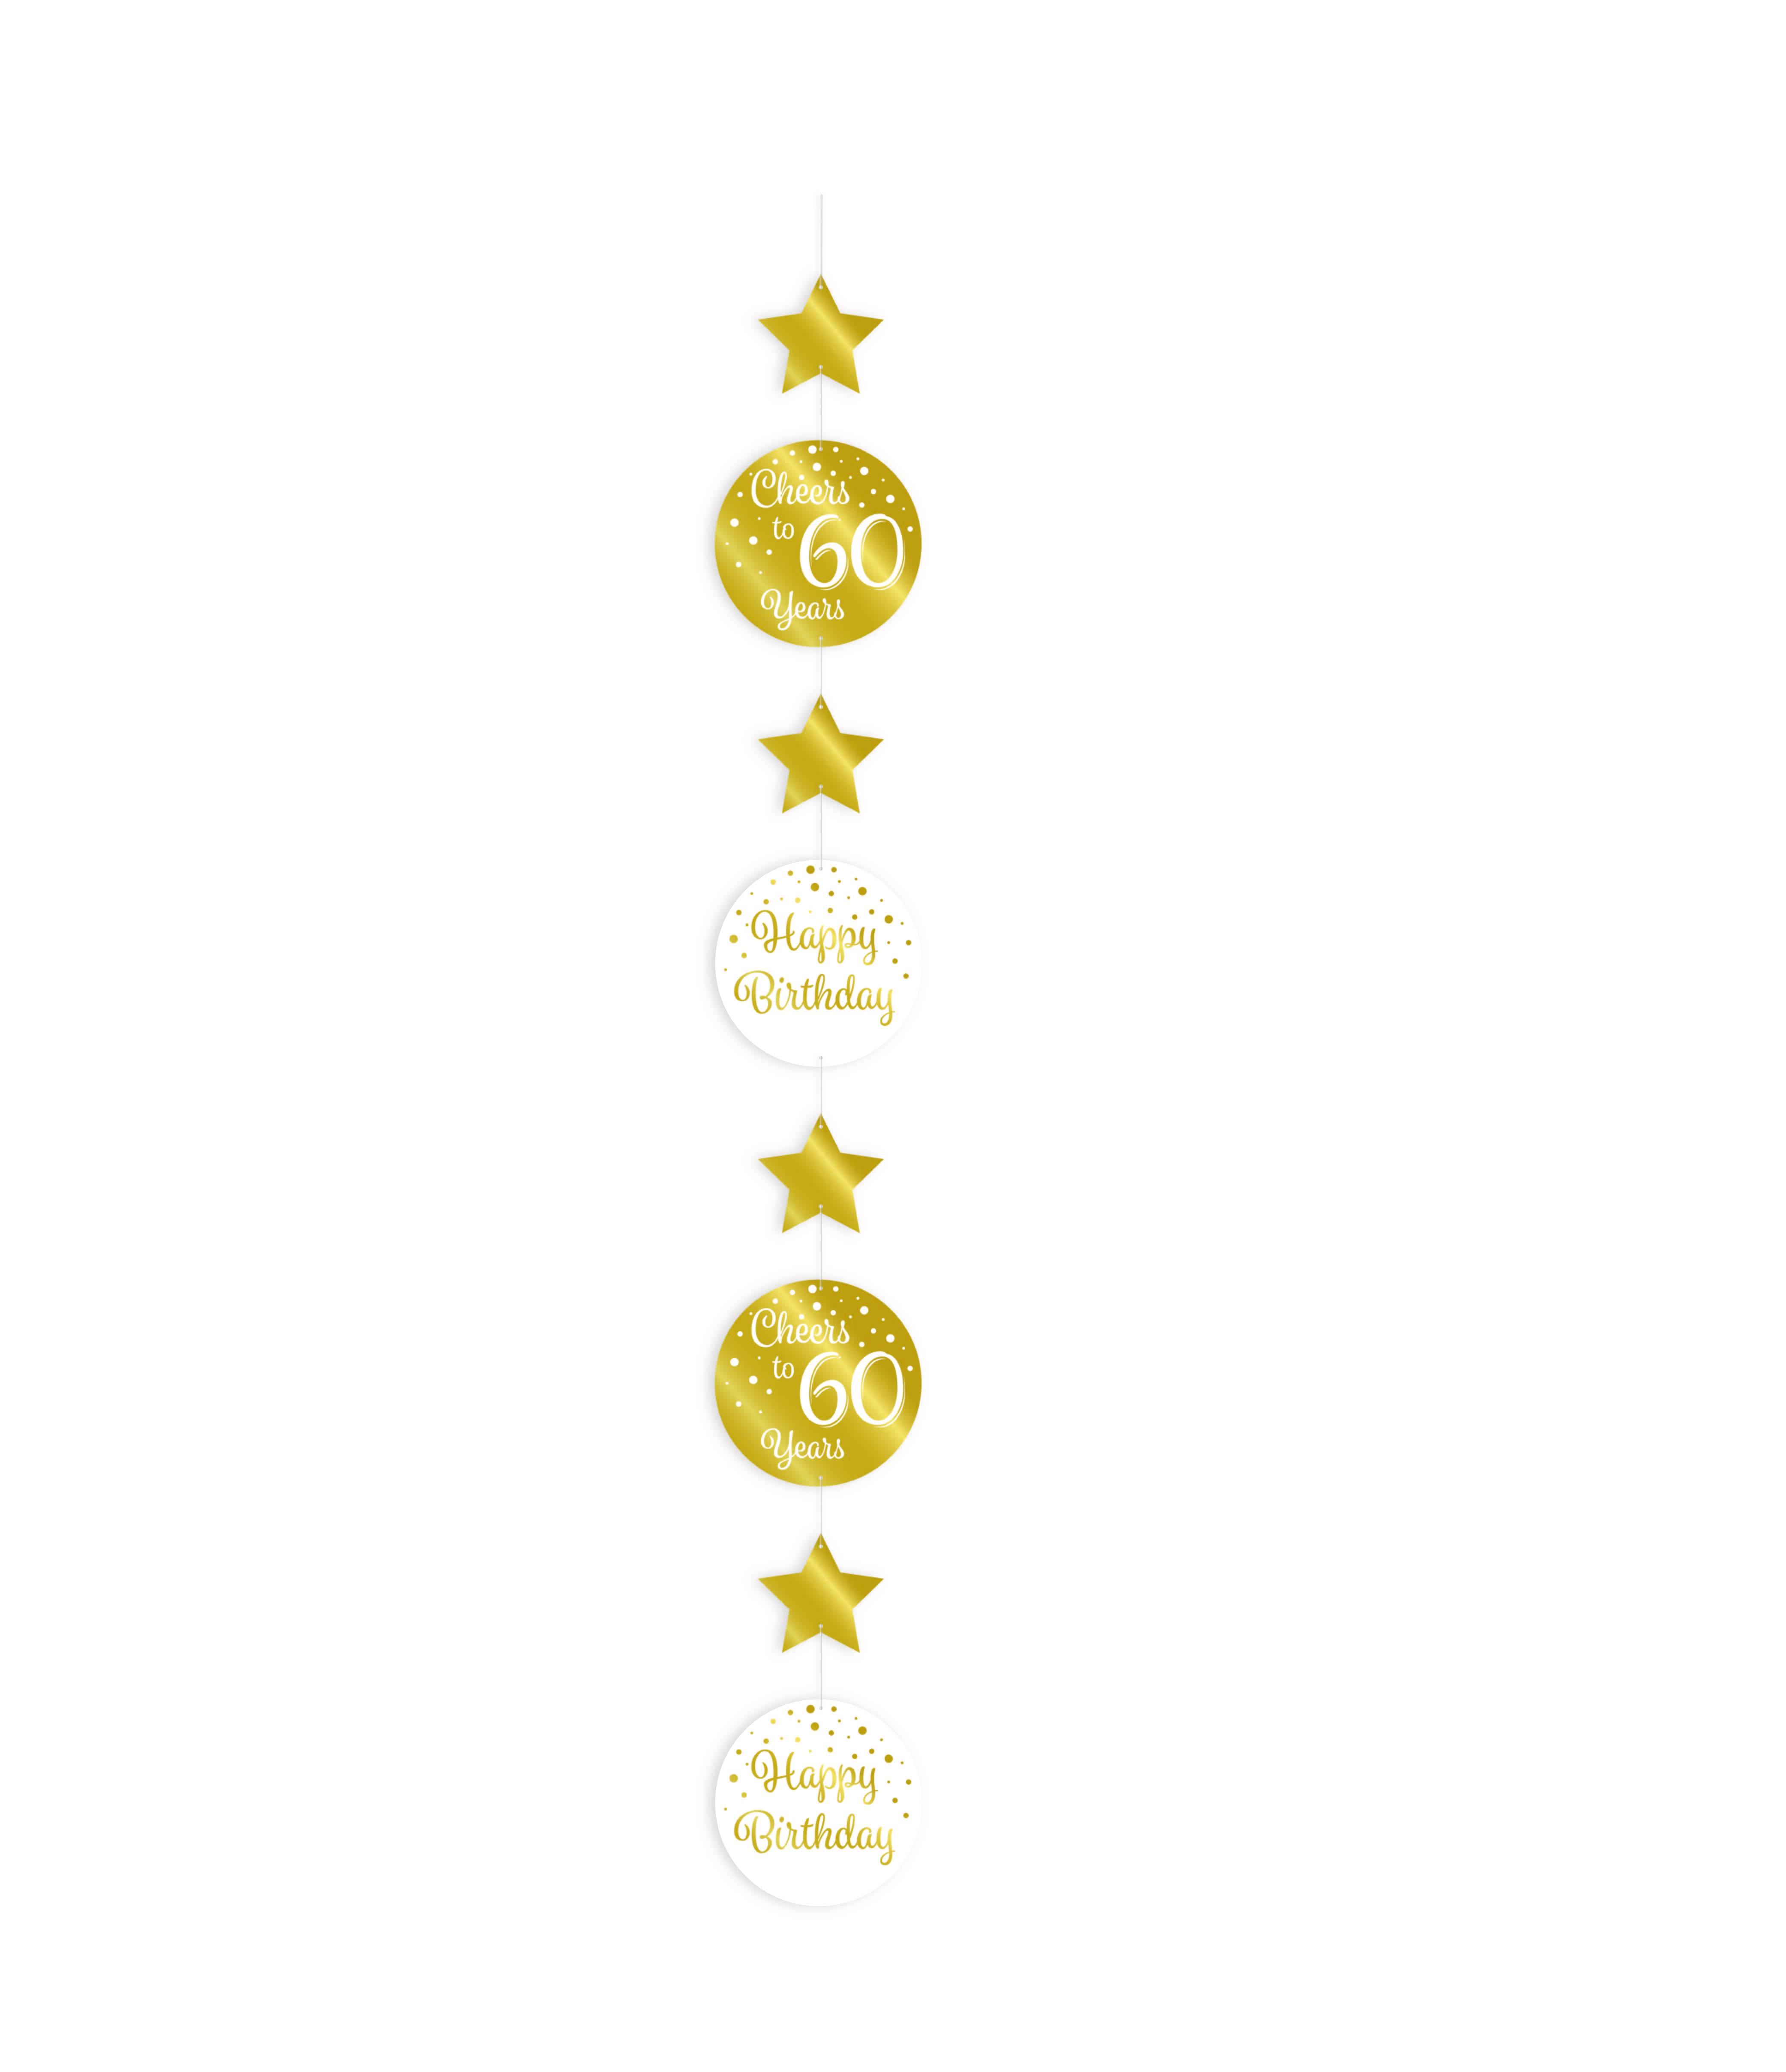 Hangdecoratie Goud/Wit Cheers to 60 Years